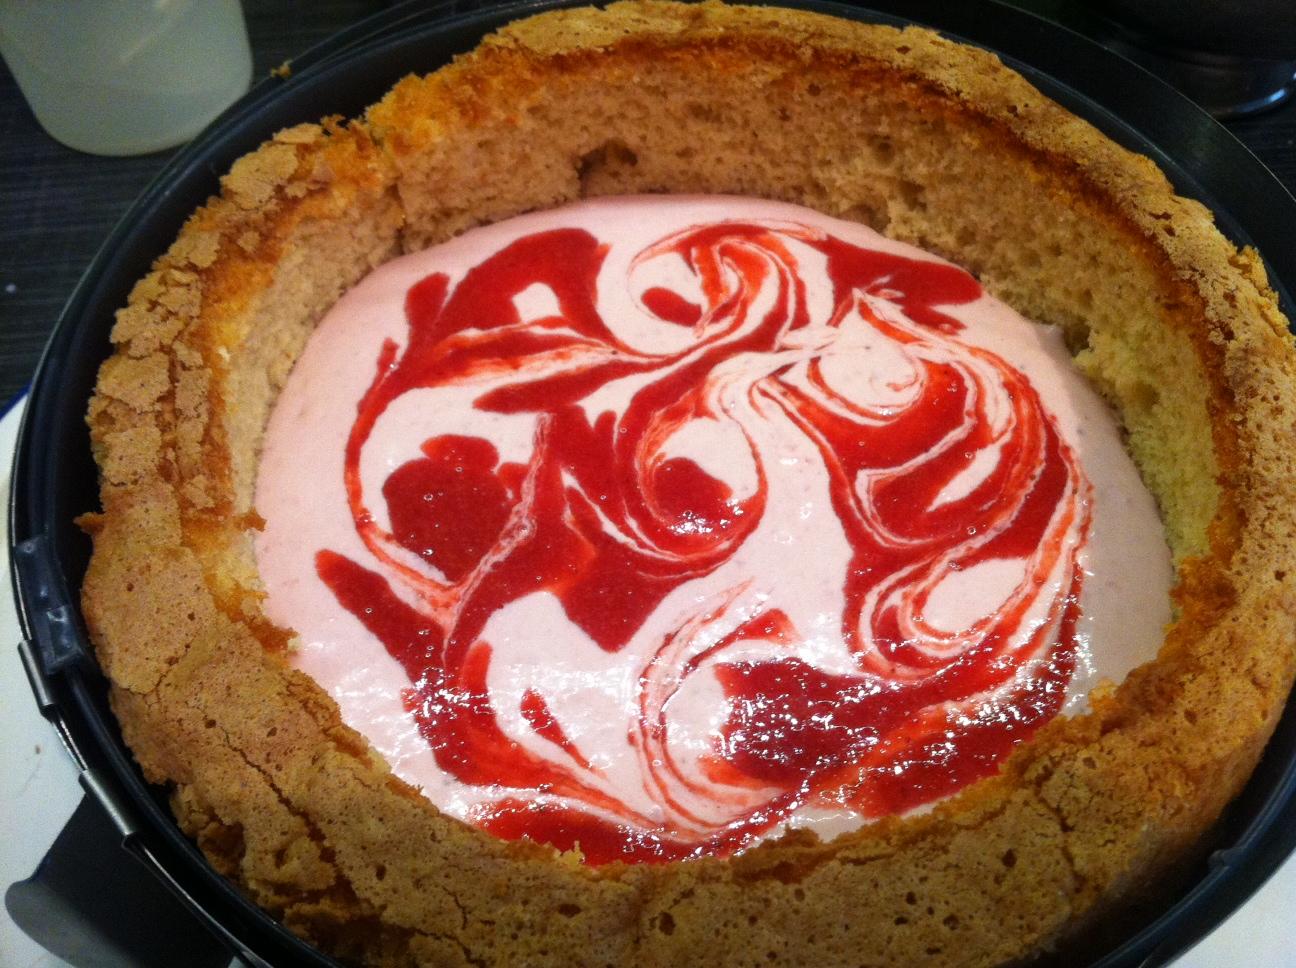 Rezept Fur Meine Lieblings Motivtortenfullung Erdbeer Mascarpone Torte